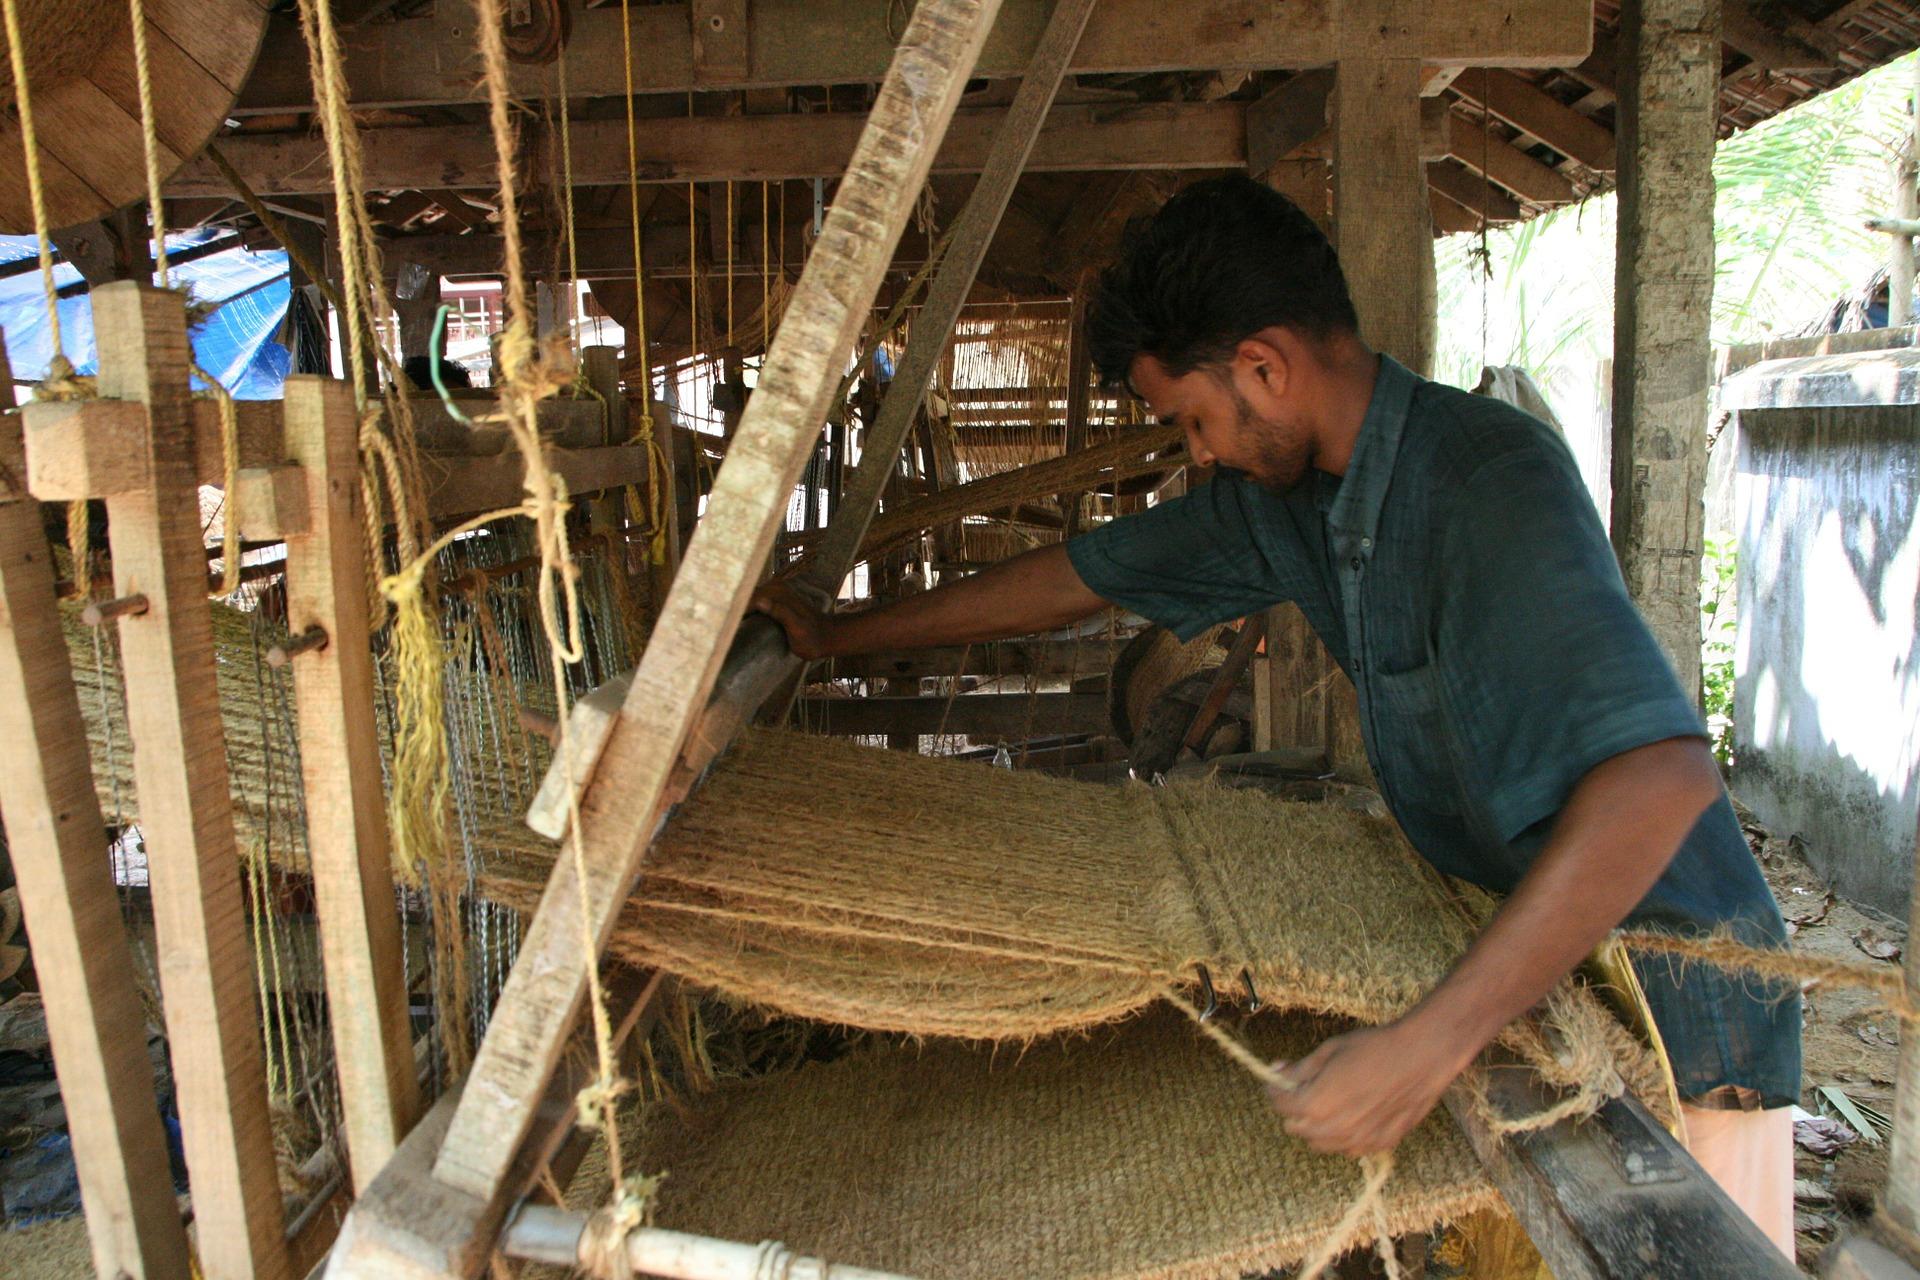 Promoting Skill & Livelihood Development